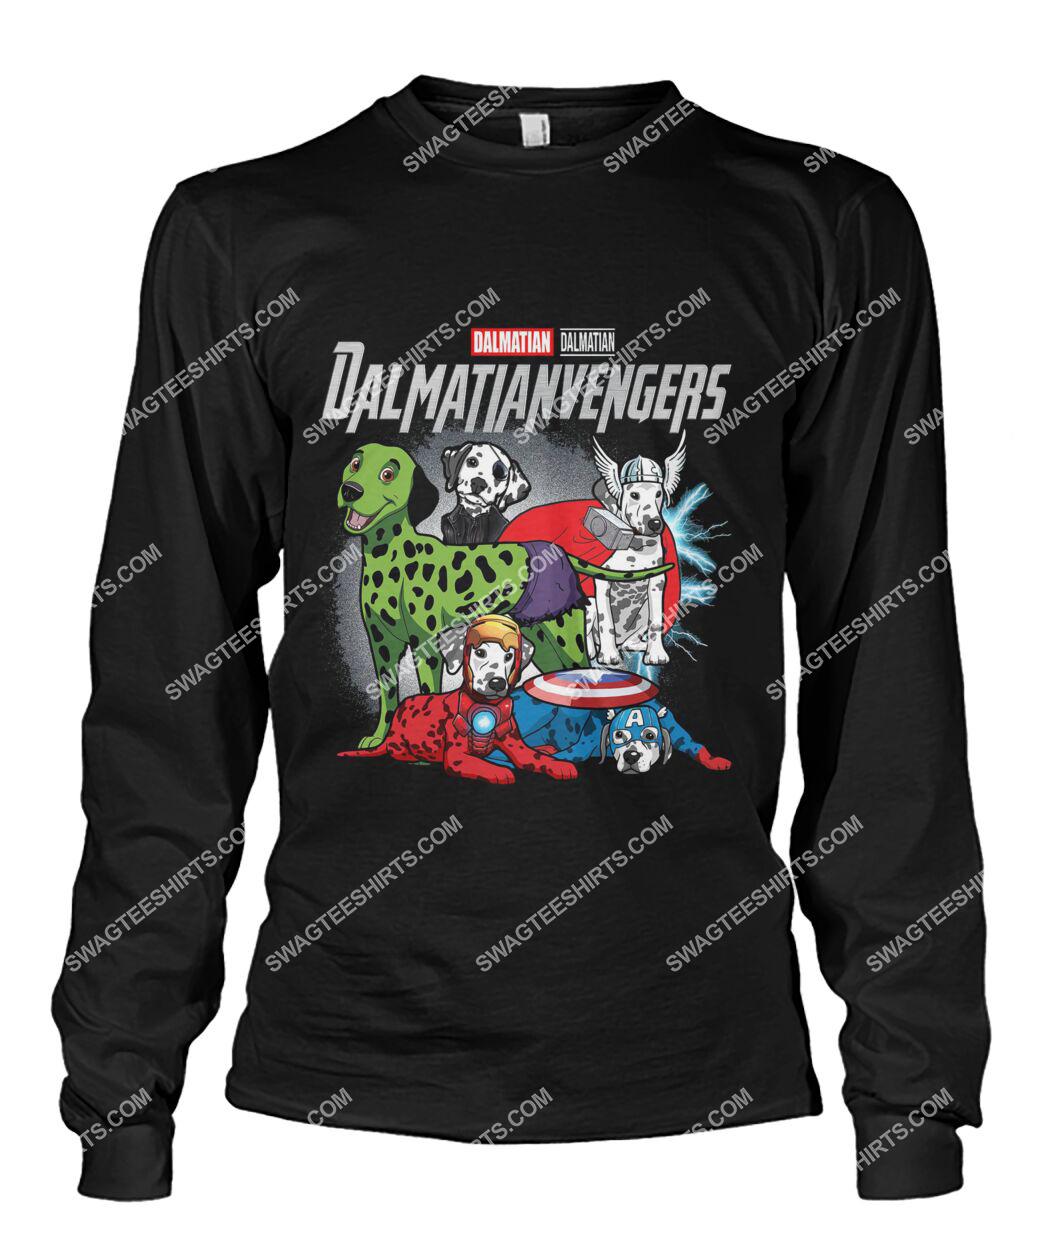 dalmatian dalmatianvengers marvel avengers dogs lover sweatshirt 1